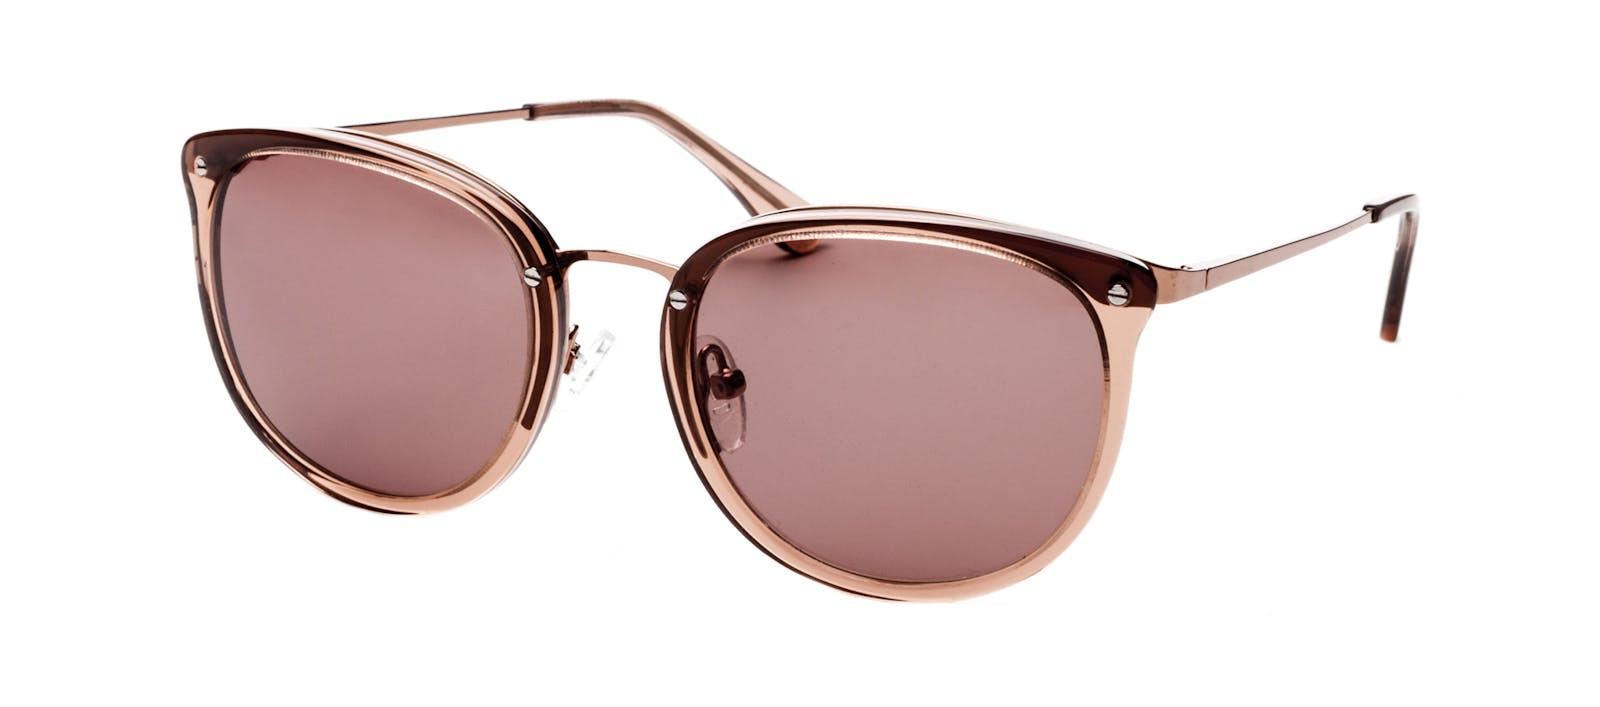 bd679e02fc Affordable Fashion Glasses Square Round Sunglasses Women Amaze Rose Tilt